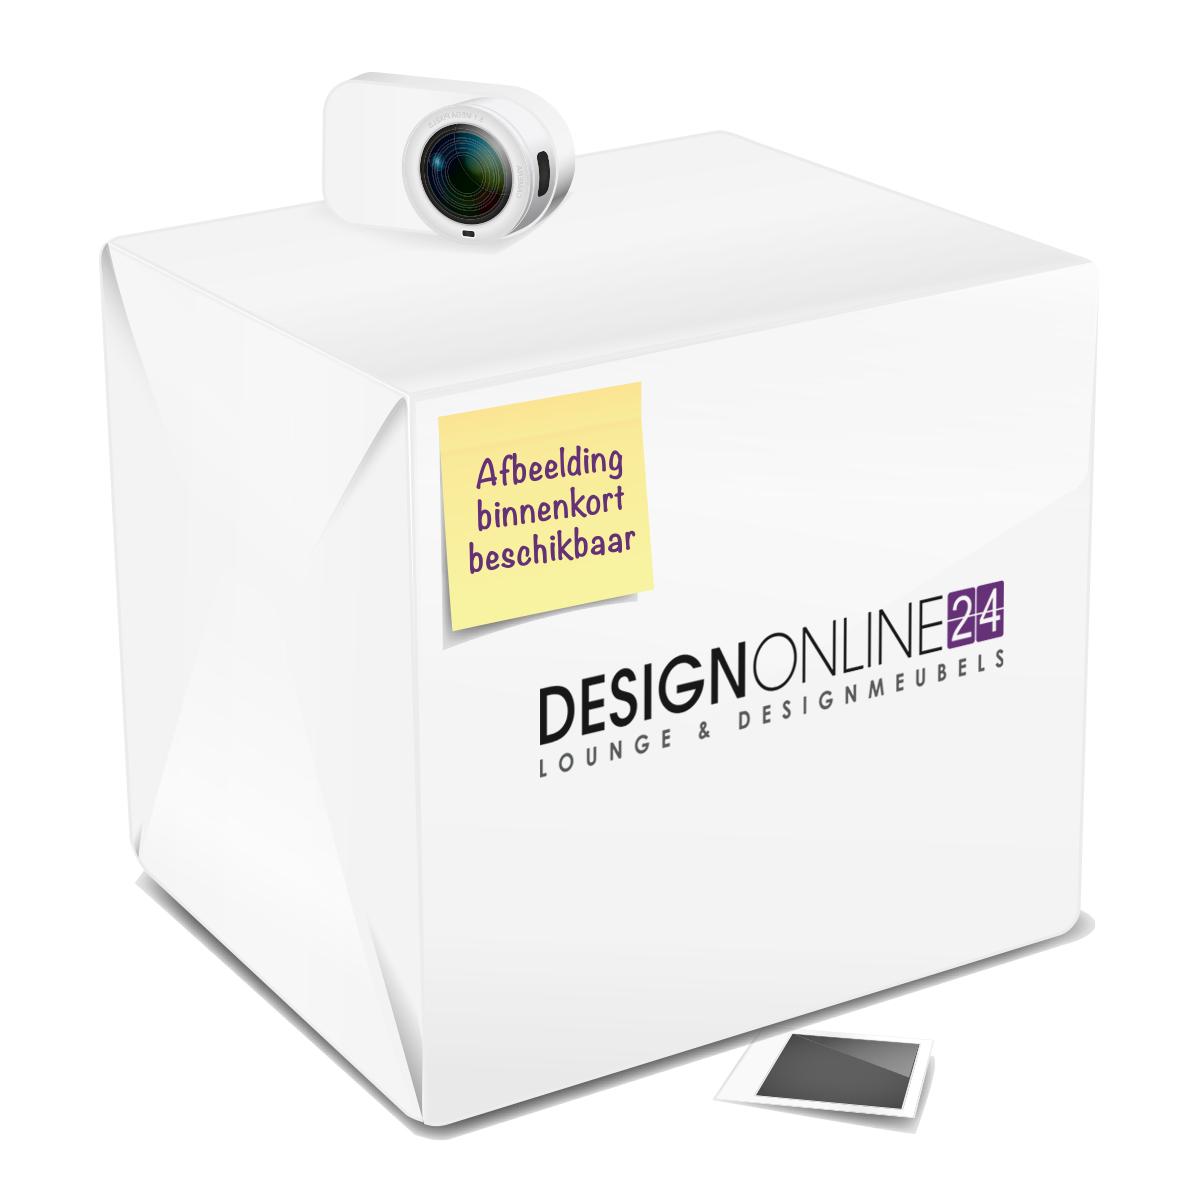 24Designs 24Designs Loungeset voor 4 Personen - Marina - Parelwit Polyrattan Wicker met Crème witte kussens